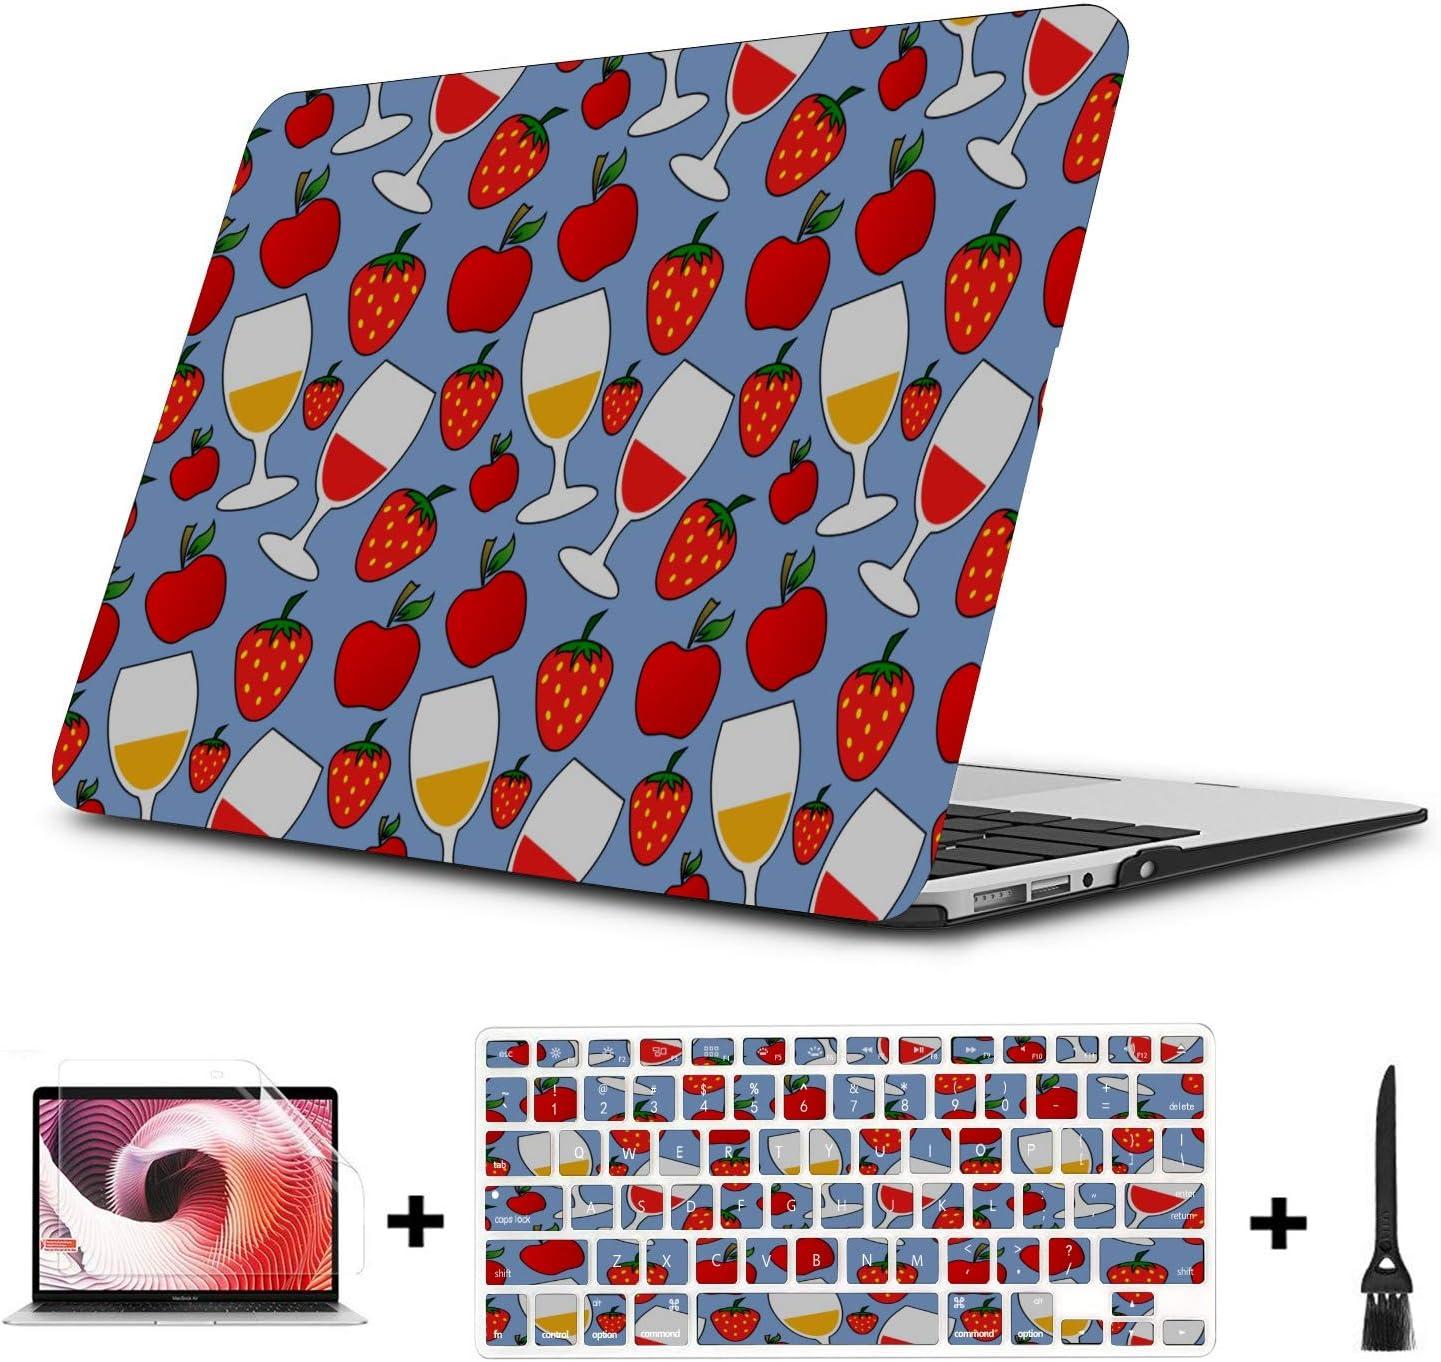 Laptop Case Mac Summer Sour Sweet Strawberry Juice Plastic Hard Shell Compatible Mac Air 11 Pro 13 15 MacBook Air Protective Case Protection for MacBook 2016-2019 Version